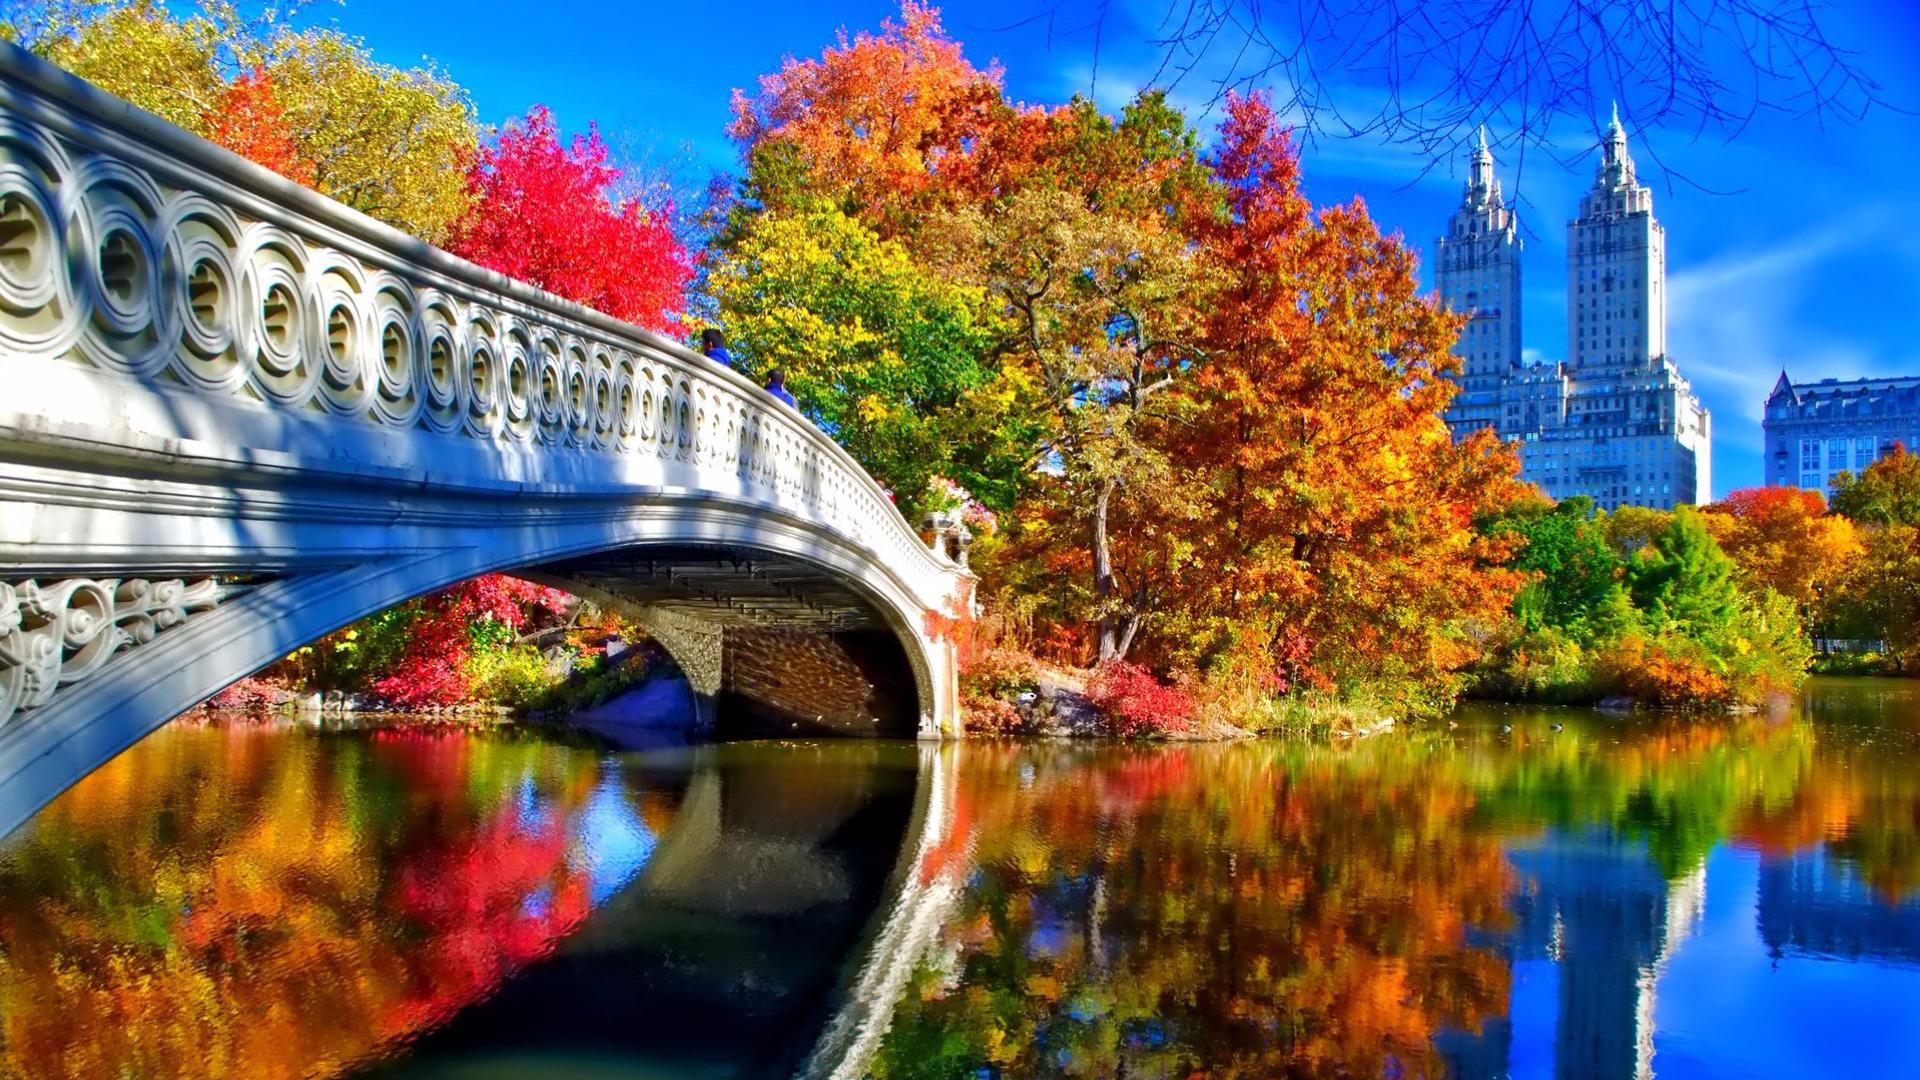 Fall Foliage Wallpaper 1920x1080 Autumn In New York Desktop Wallpaper In 1920 215 1080 Hd